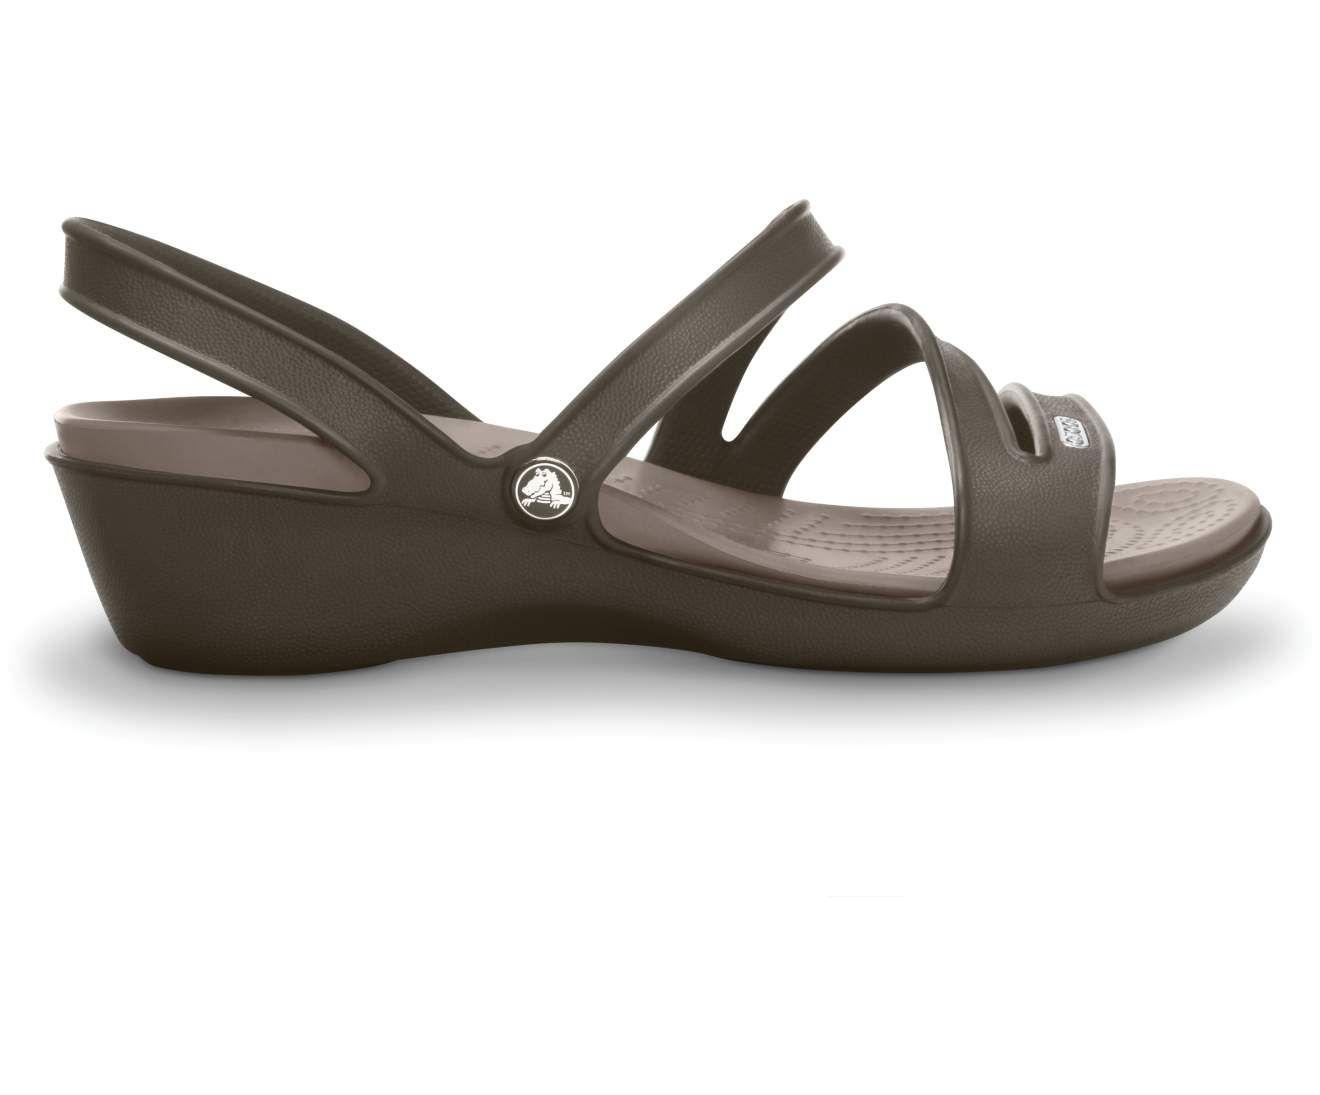 fd95ebc7c61e Crocs™ Patricia Wedge Sandal